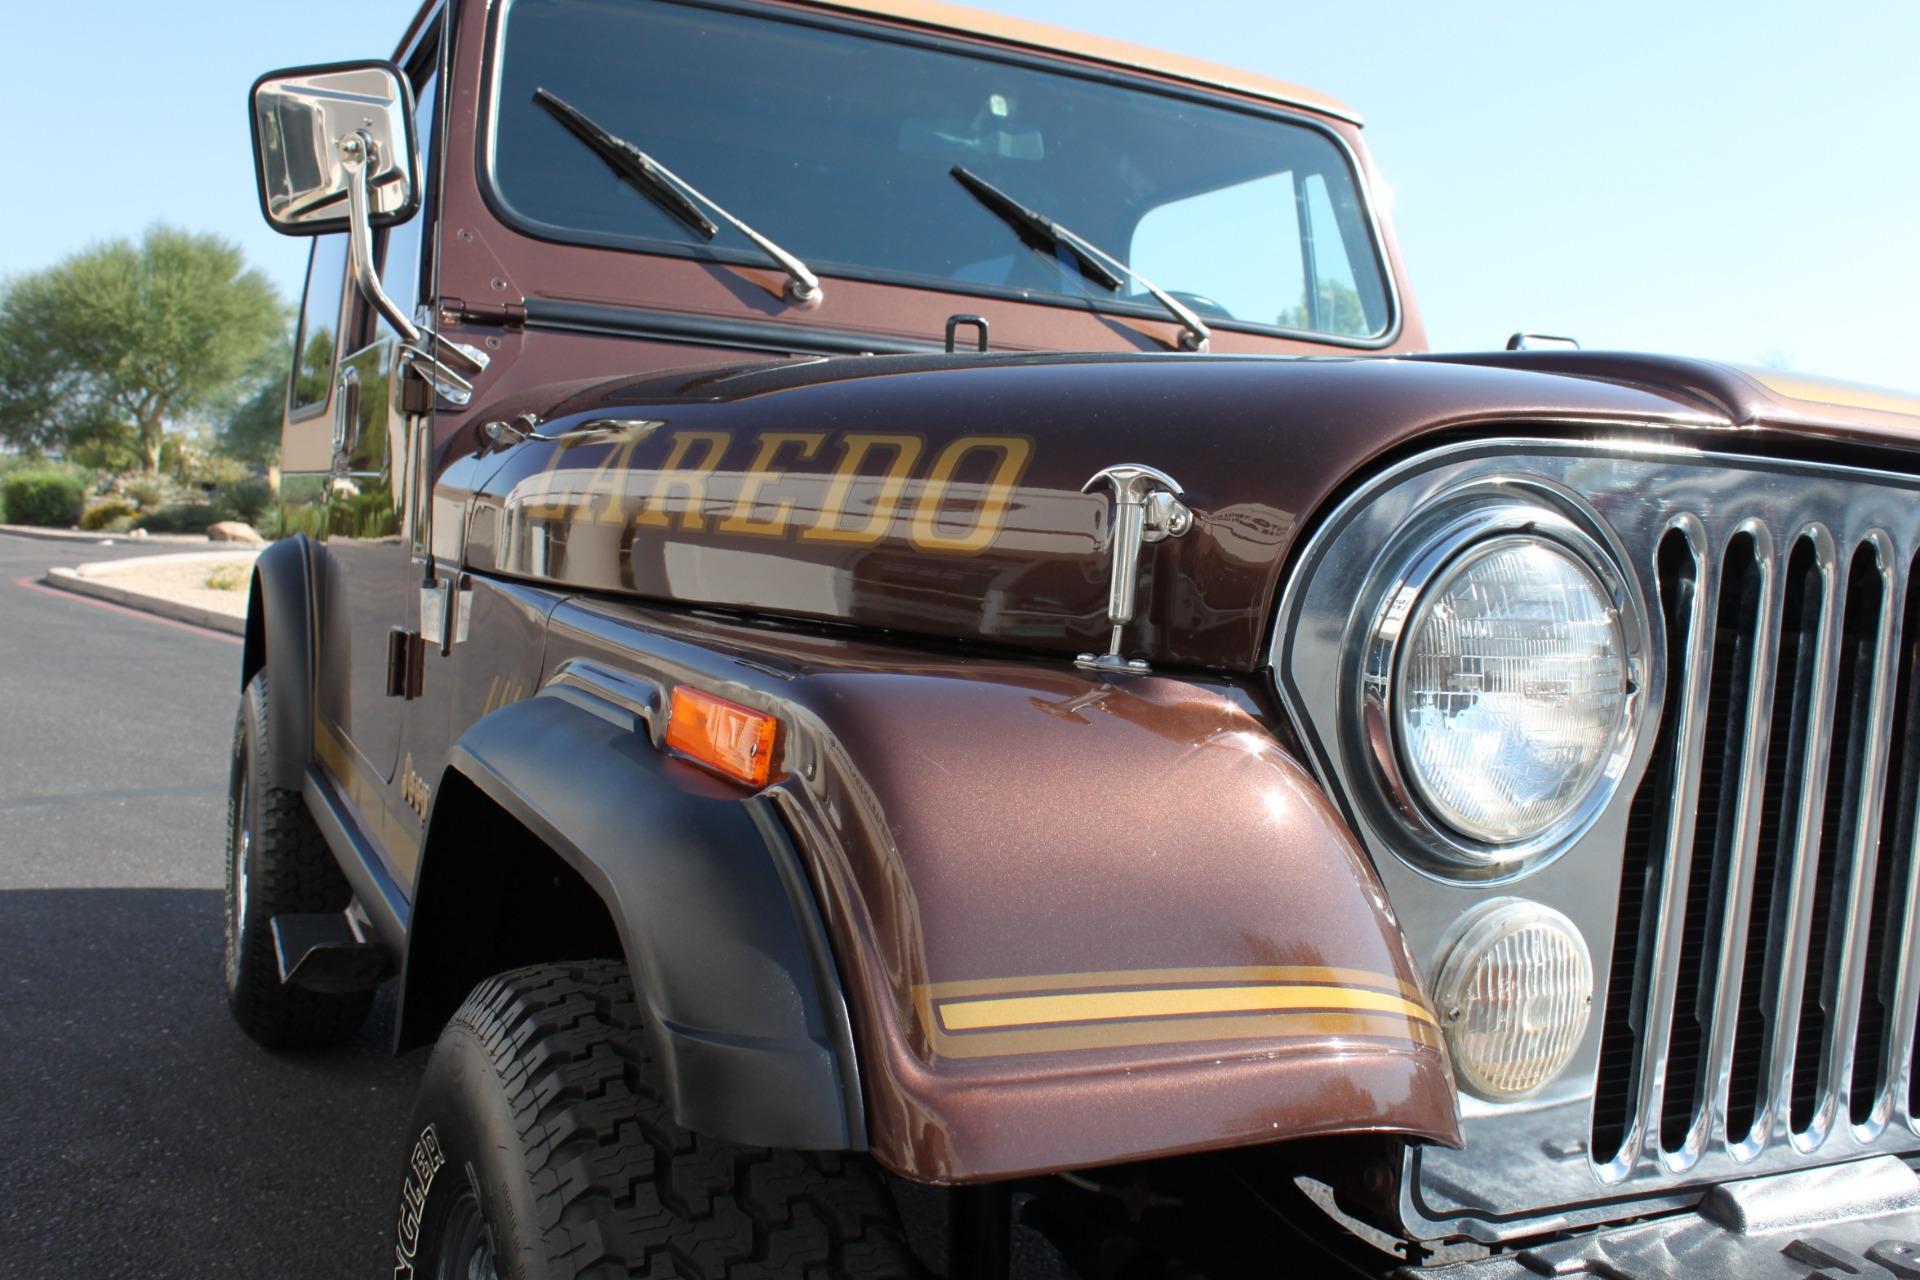 Used-1985-Jeep-CJ-7-Laredo-4WD-4X4